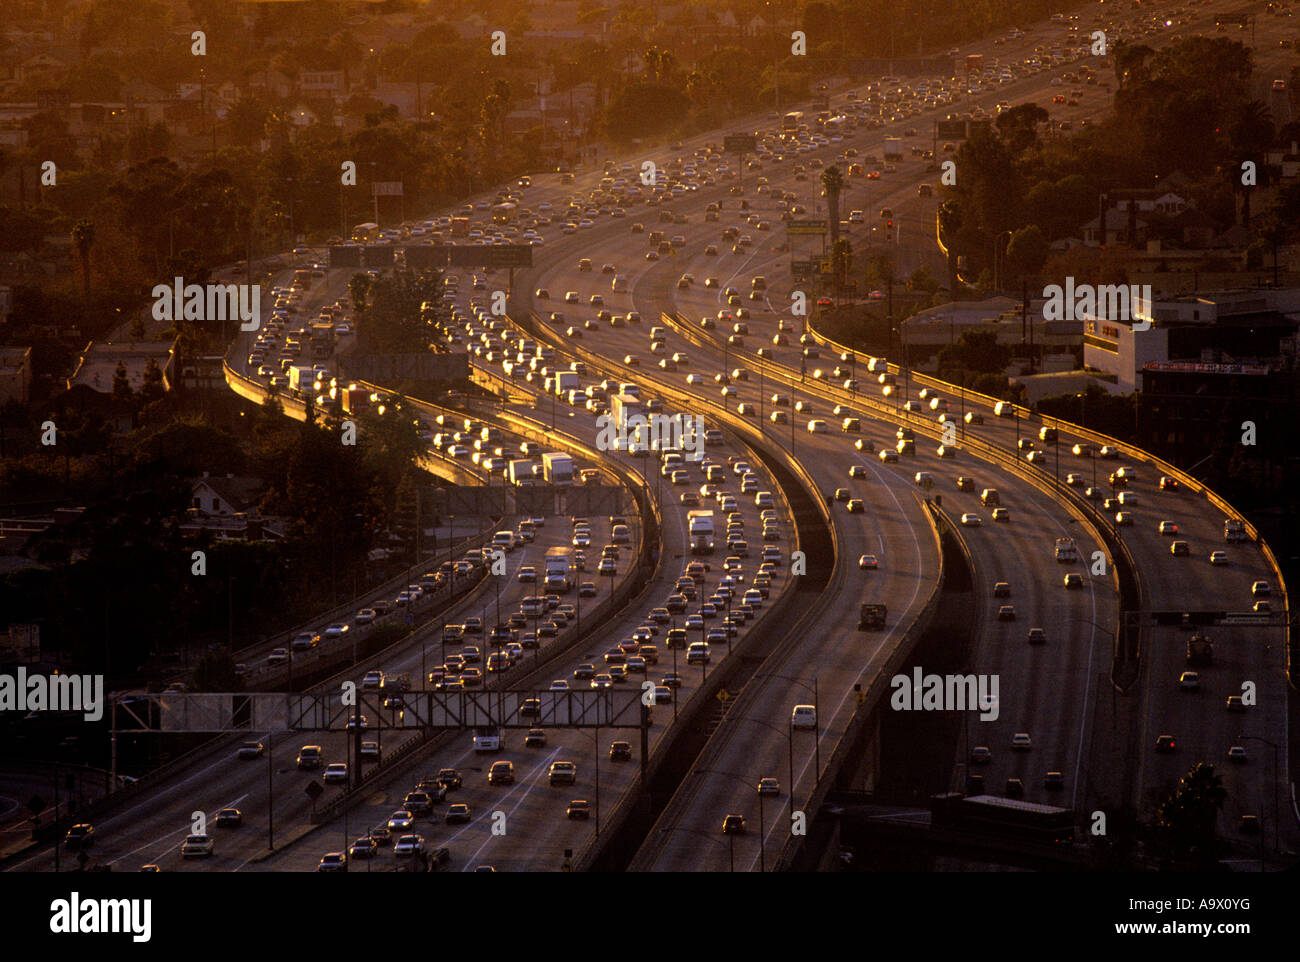 AERIAL ROAD TRAFFIC CONGESTION SANTA MONICA FREEWAY LOS ANGELES KALIFORNIEN USA Stockbild